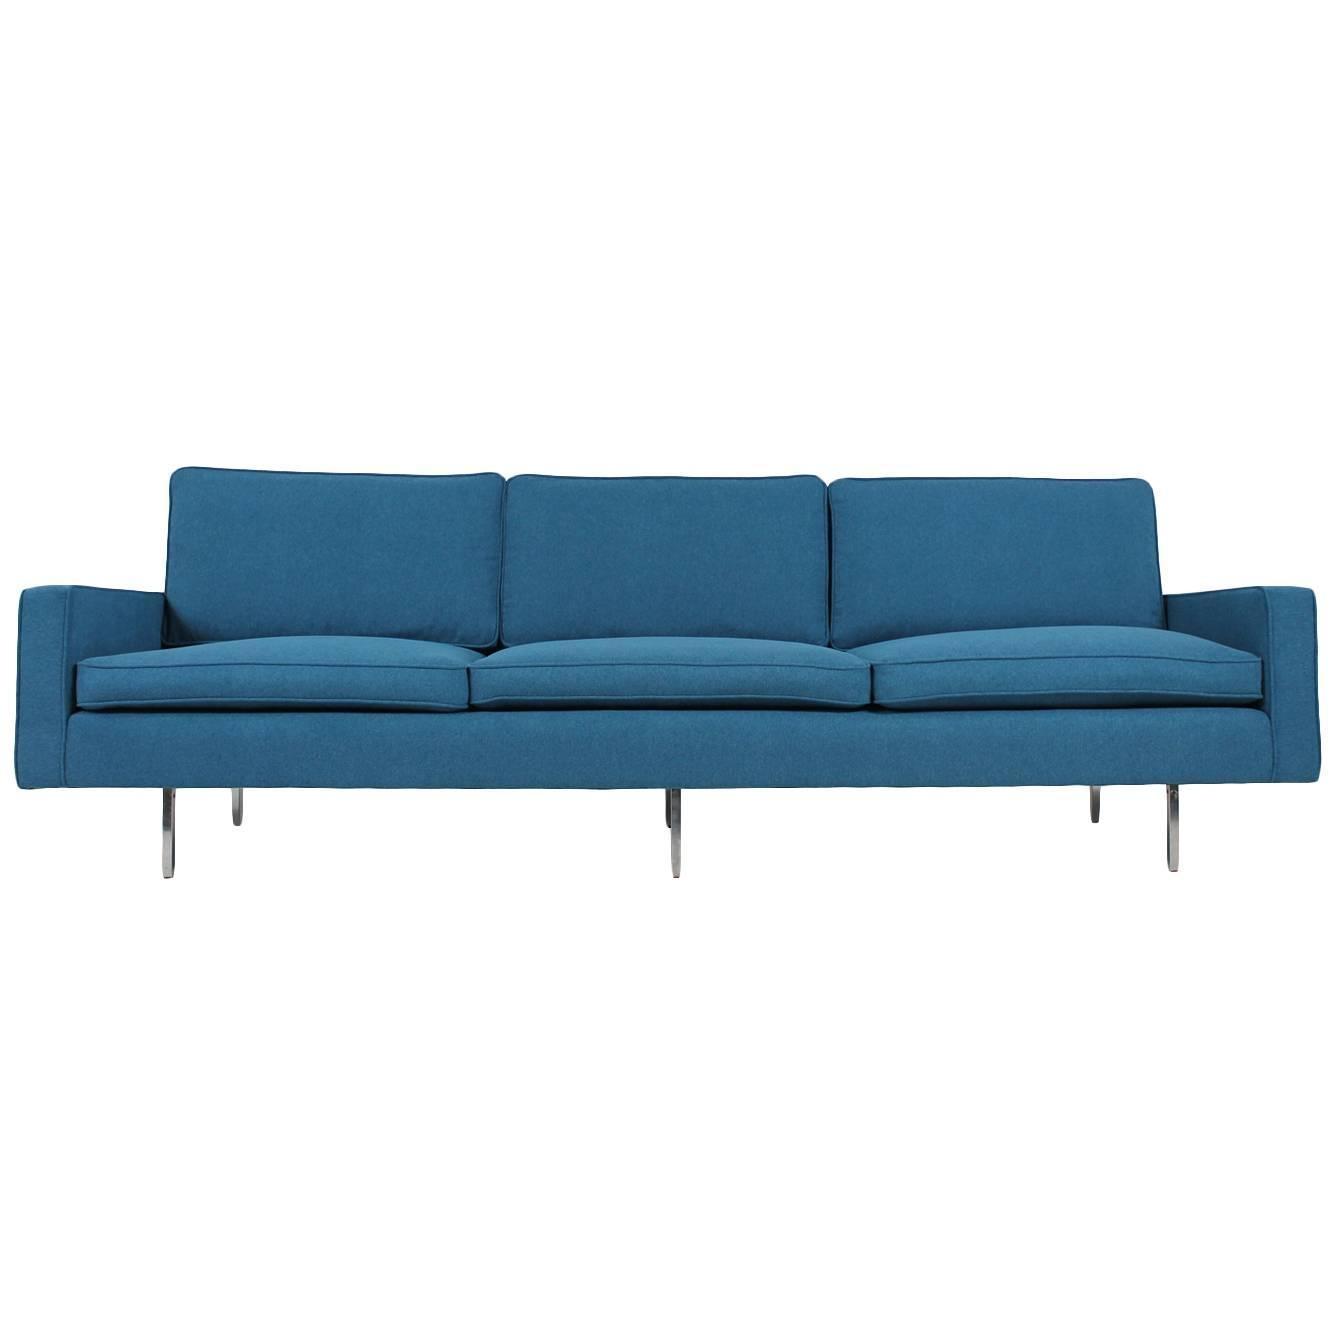 Beautiful Mid Century Florence Knoll Sofa Mod (Image 1 of 20)